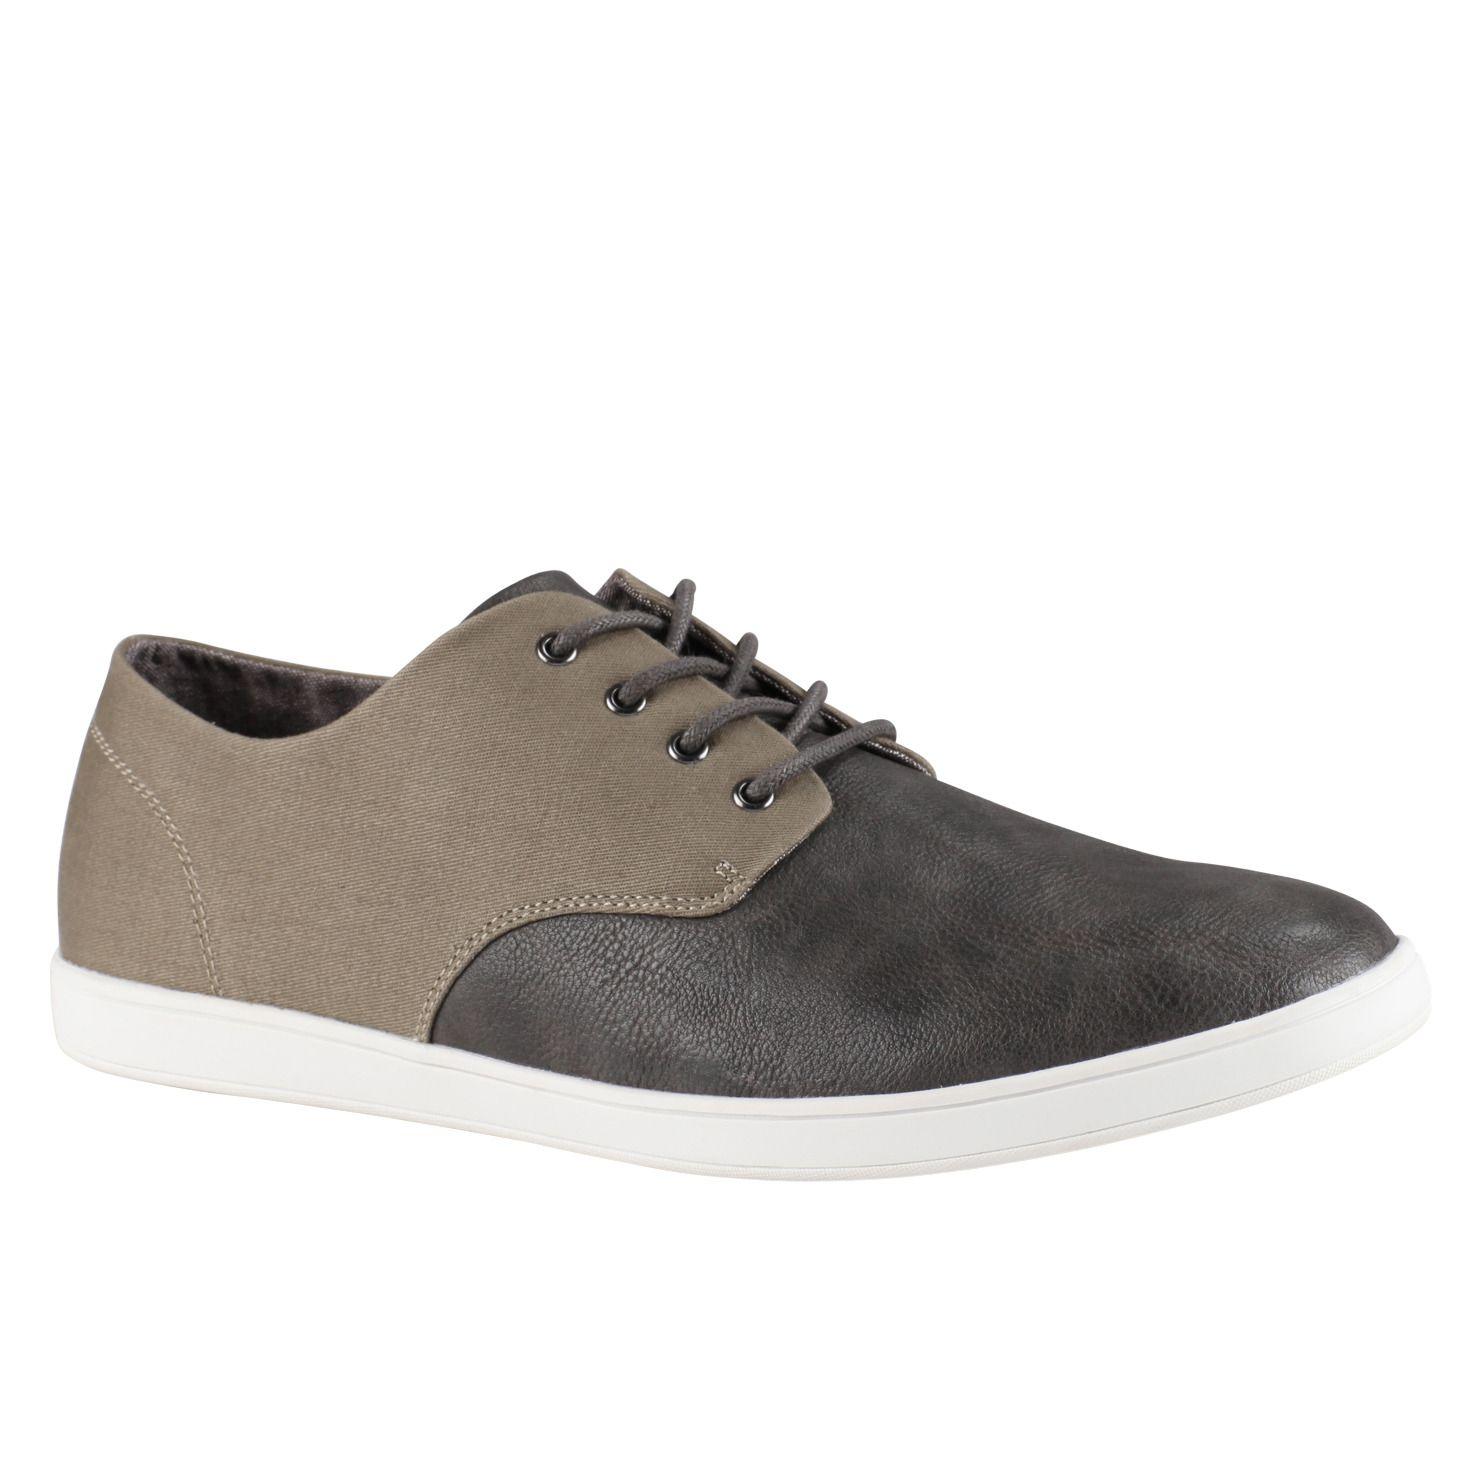 Paulman Shoes Mens Sneakers Men Mens Fashion